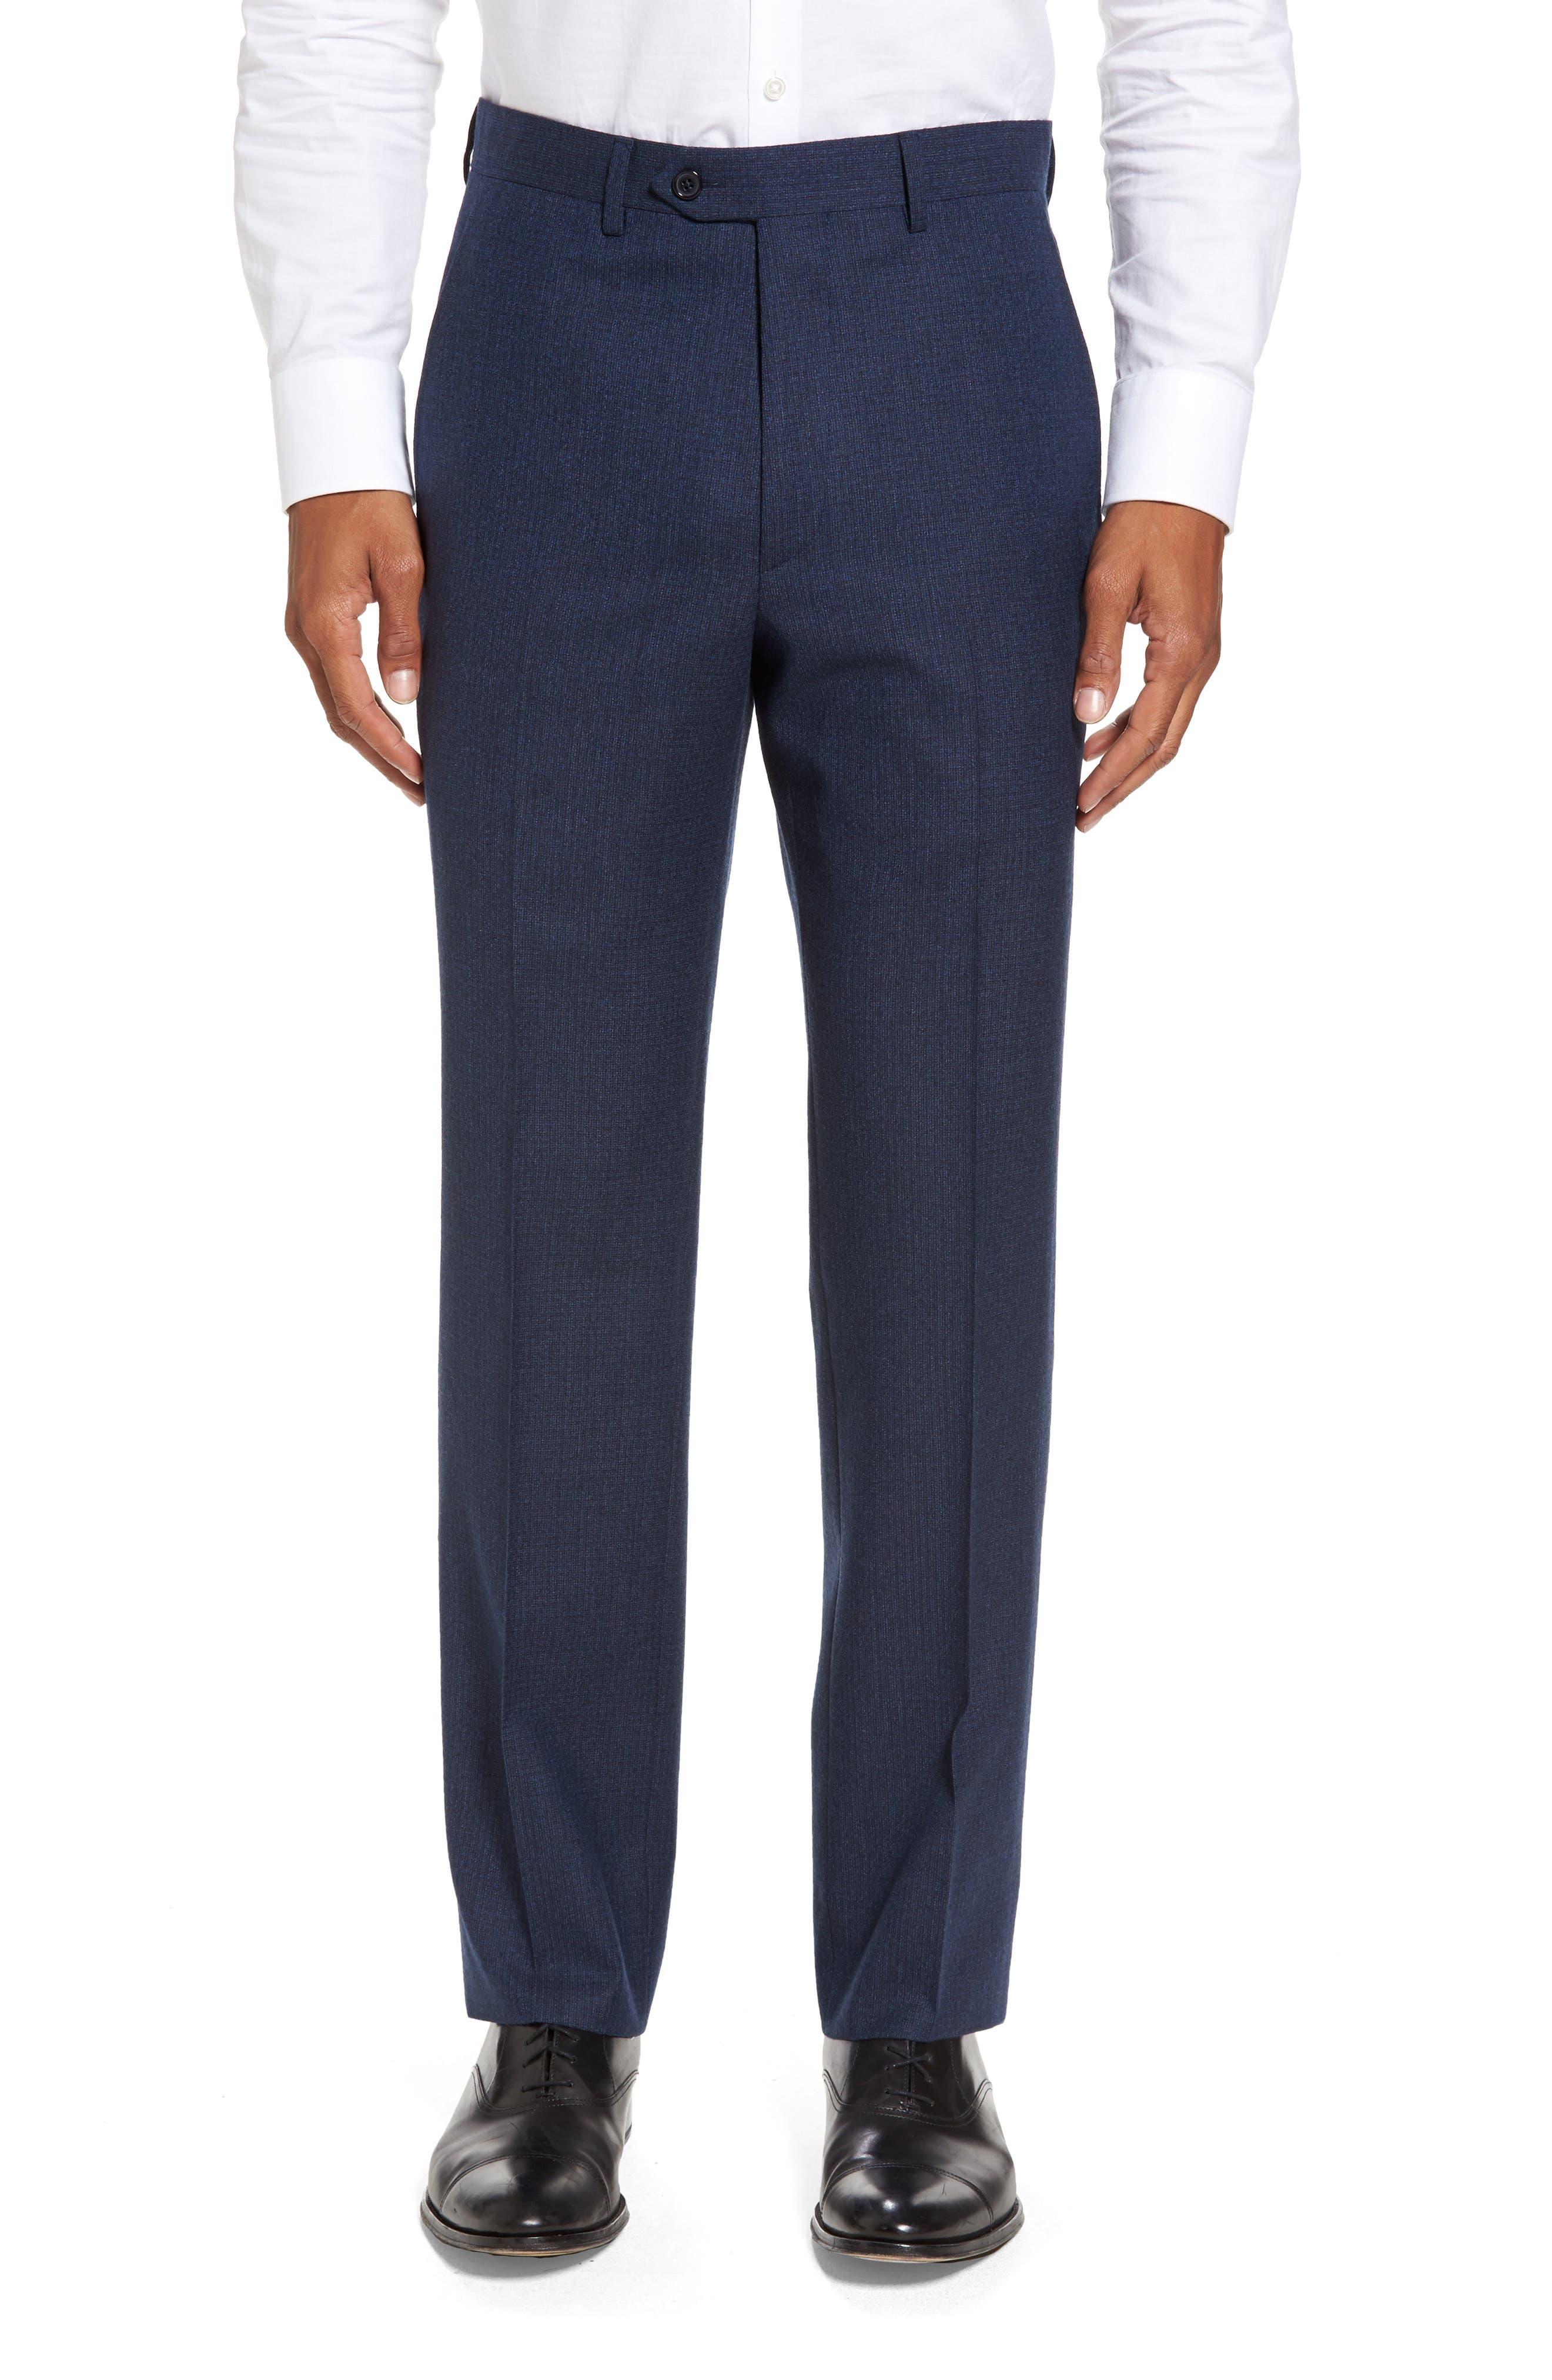 Main Image - Santorelli Romero Regular Fit Flat Front Trousers